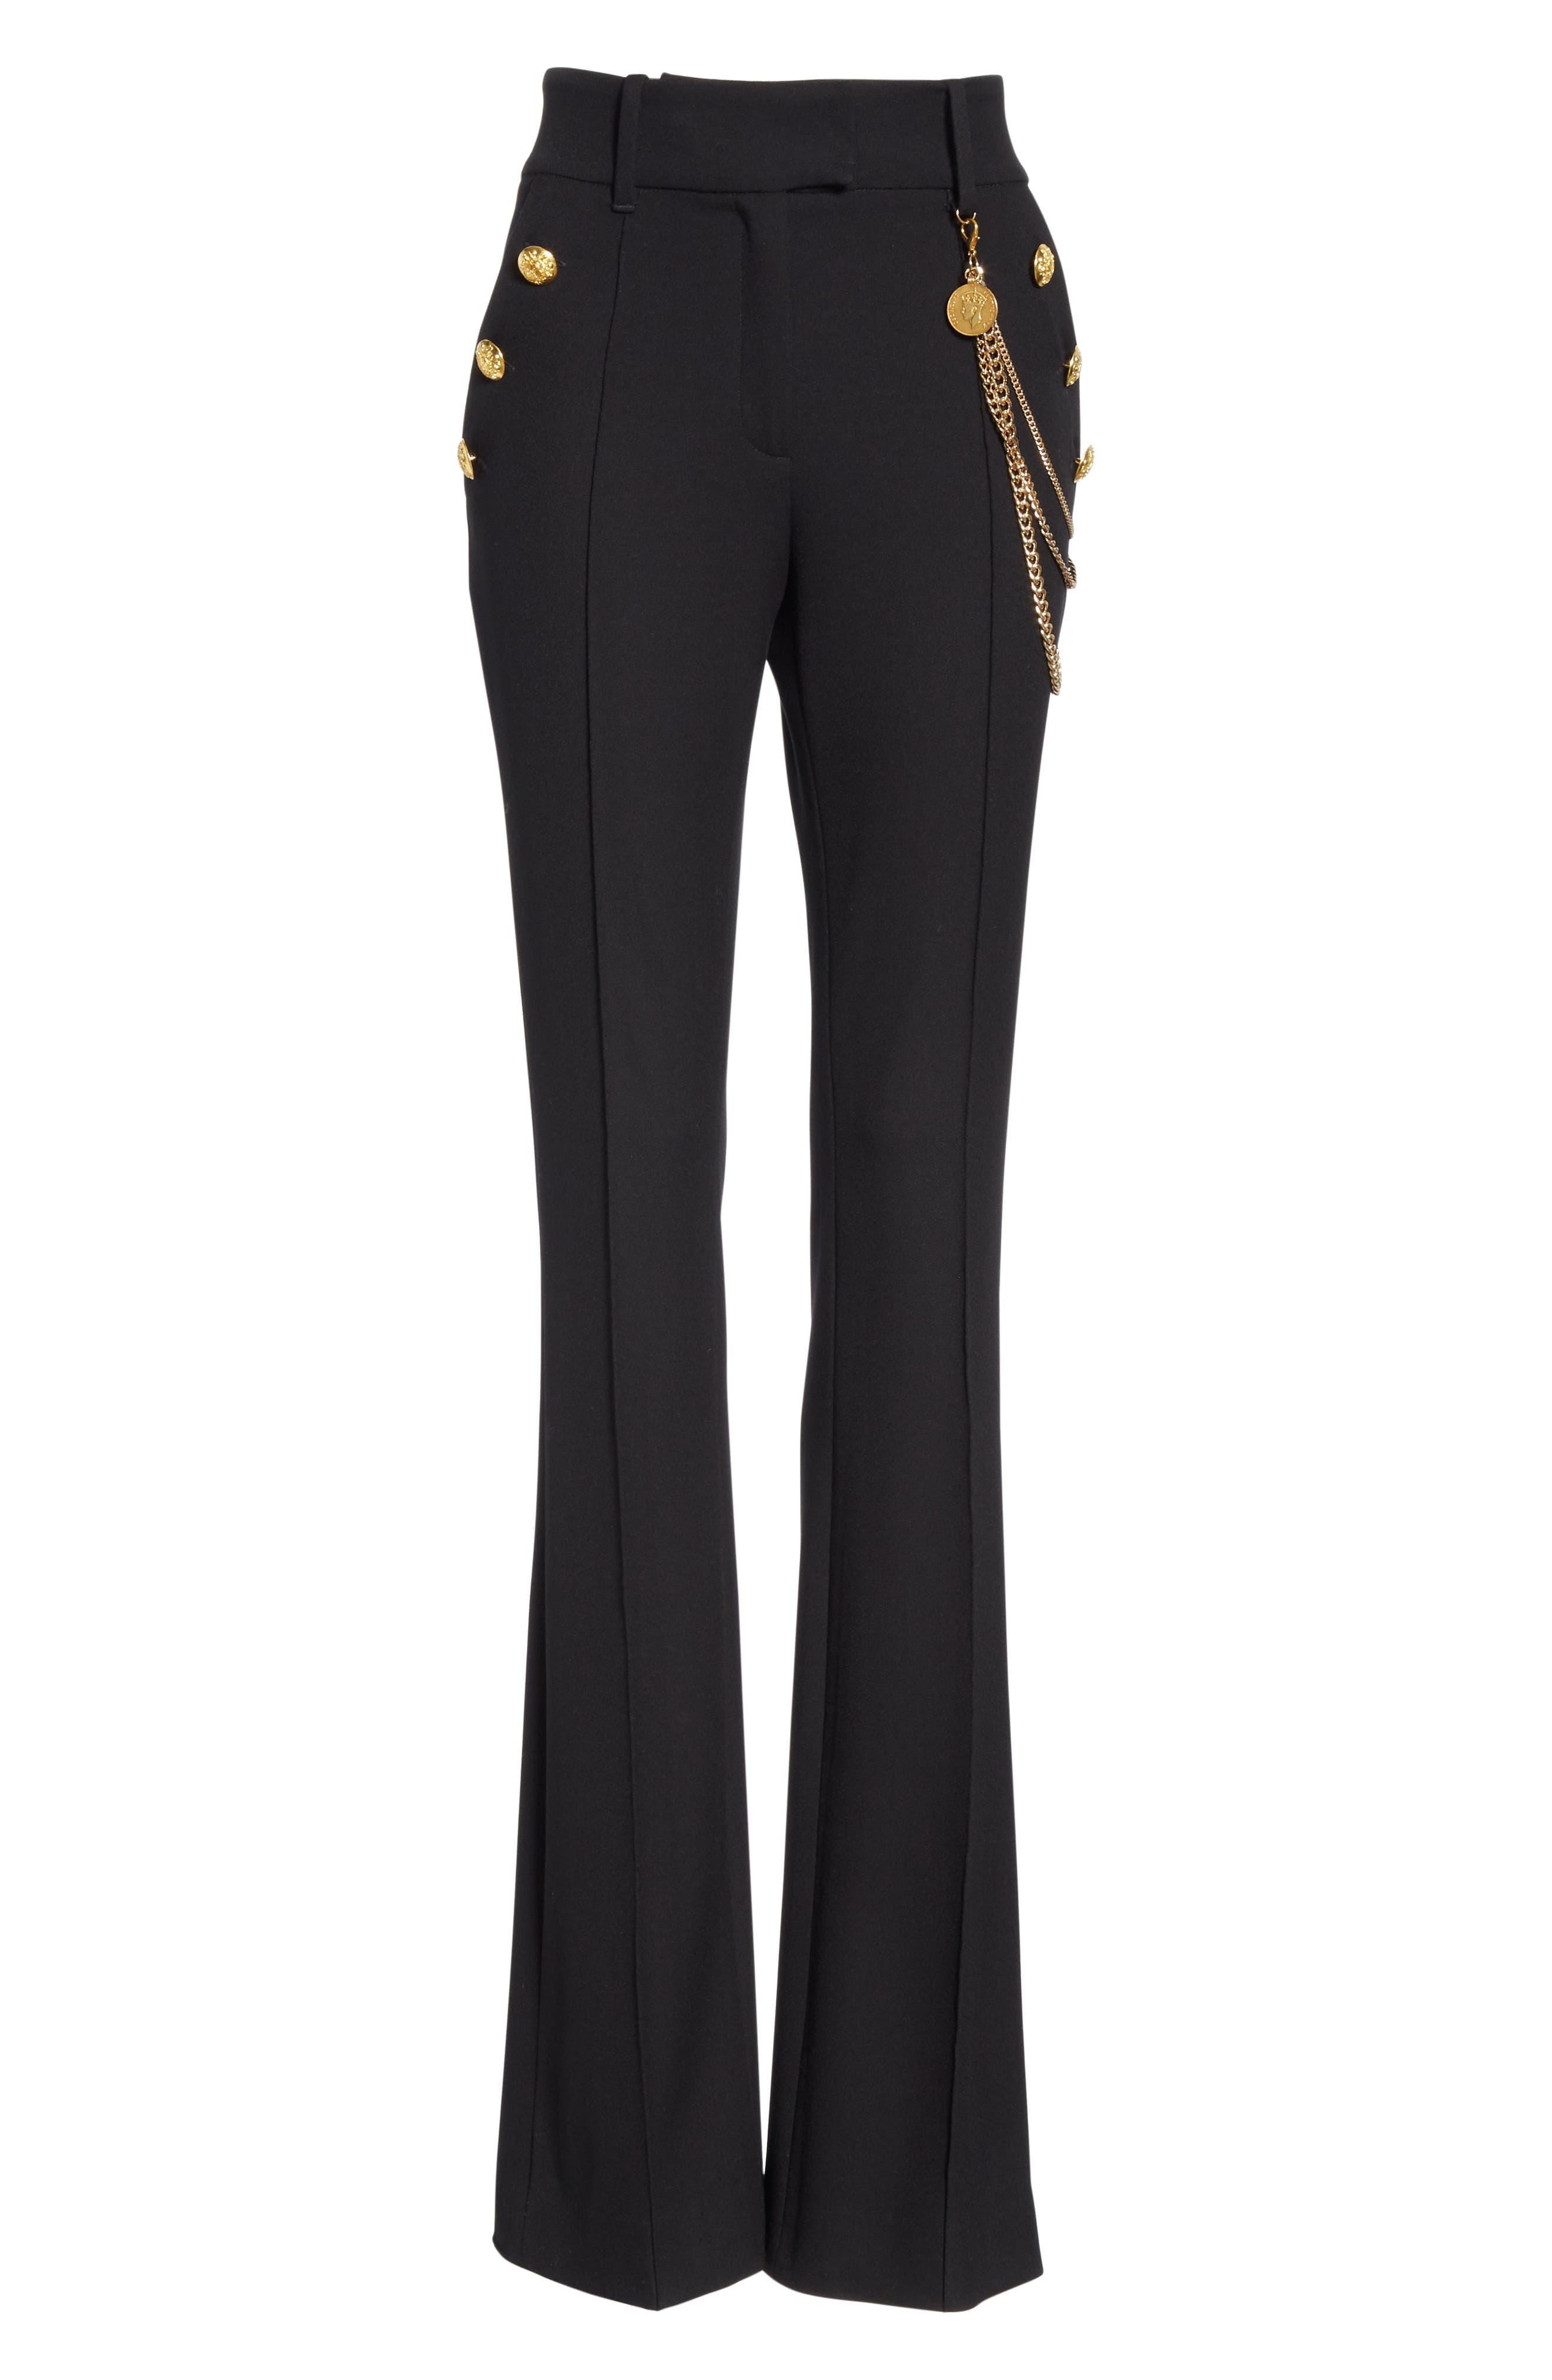 Alair Chain Detail Sailor Trousers,                             Alternate thumbnail 6, color,                             BLACK